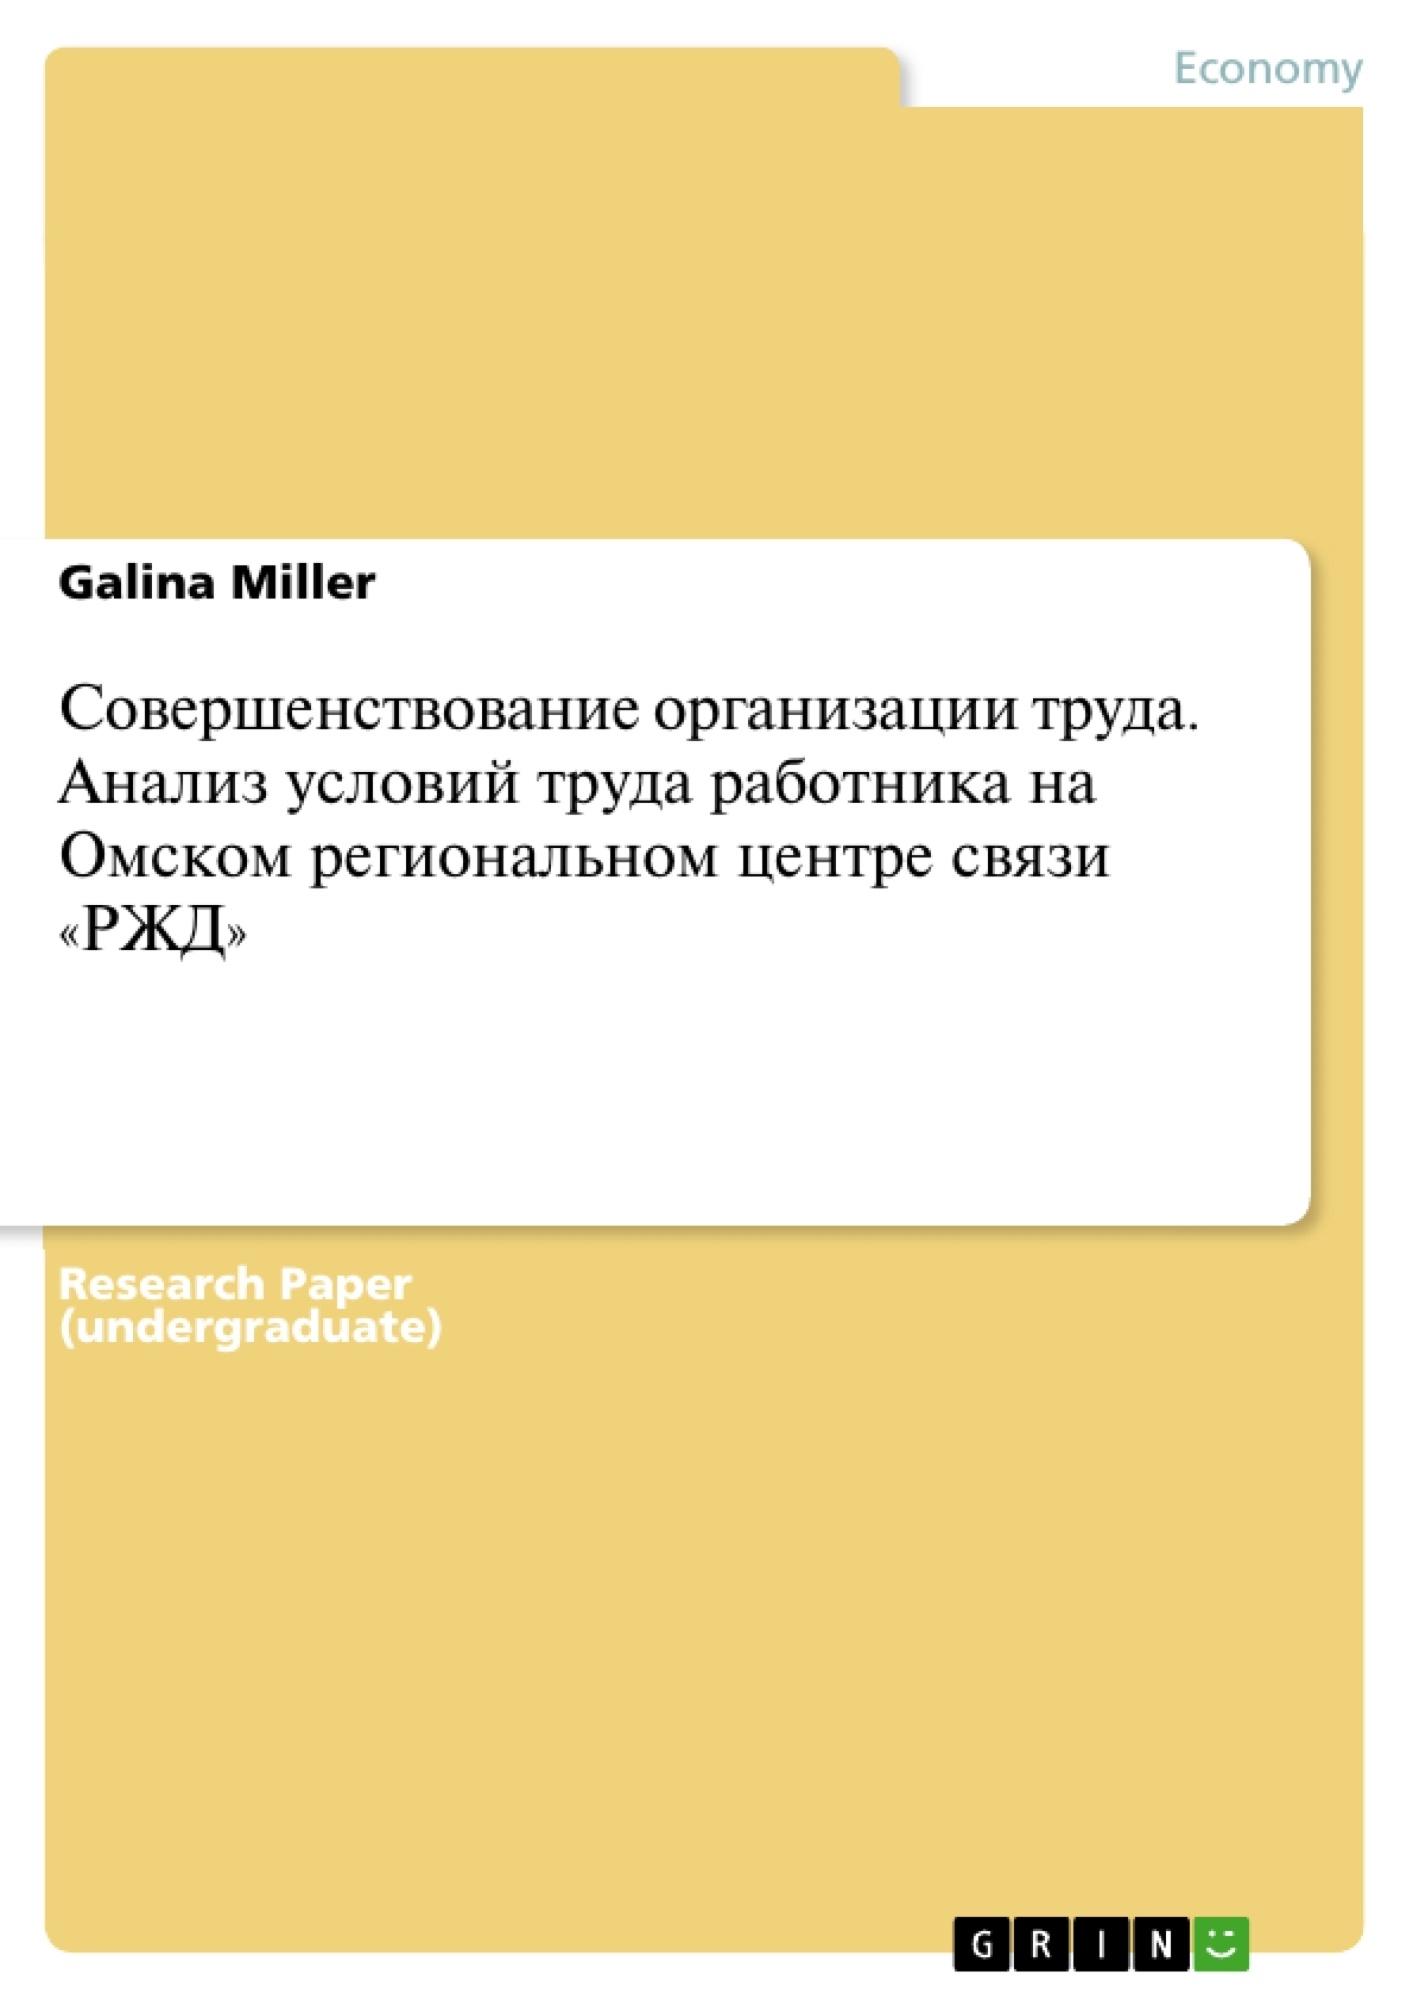 Title: Совершенствование организации труда. Анализ условий труда работника на Омском региональном центре связи «РЖД»